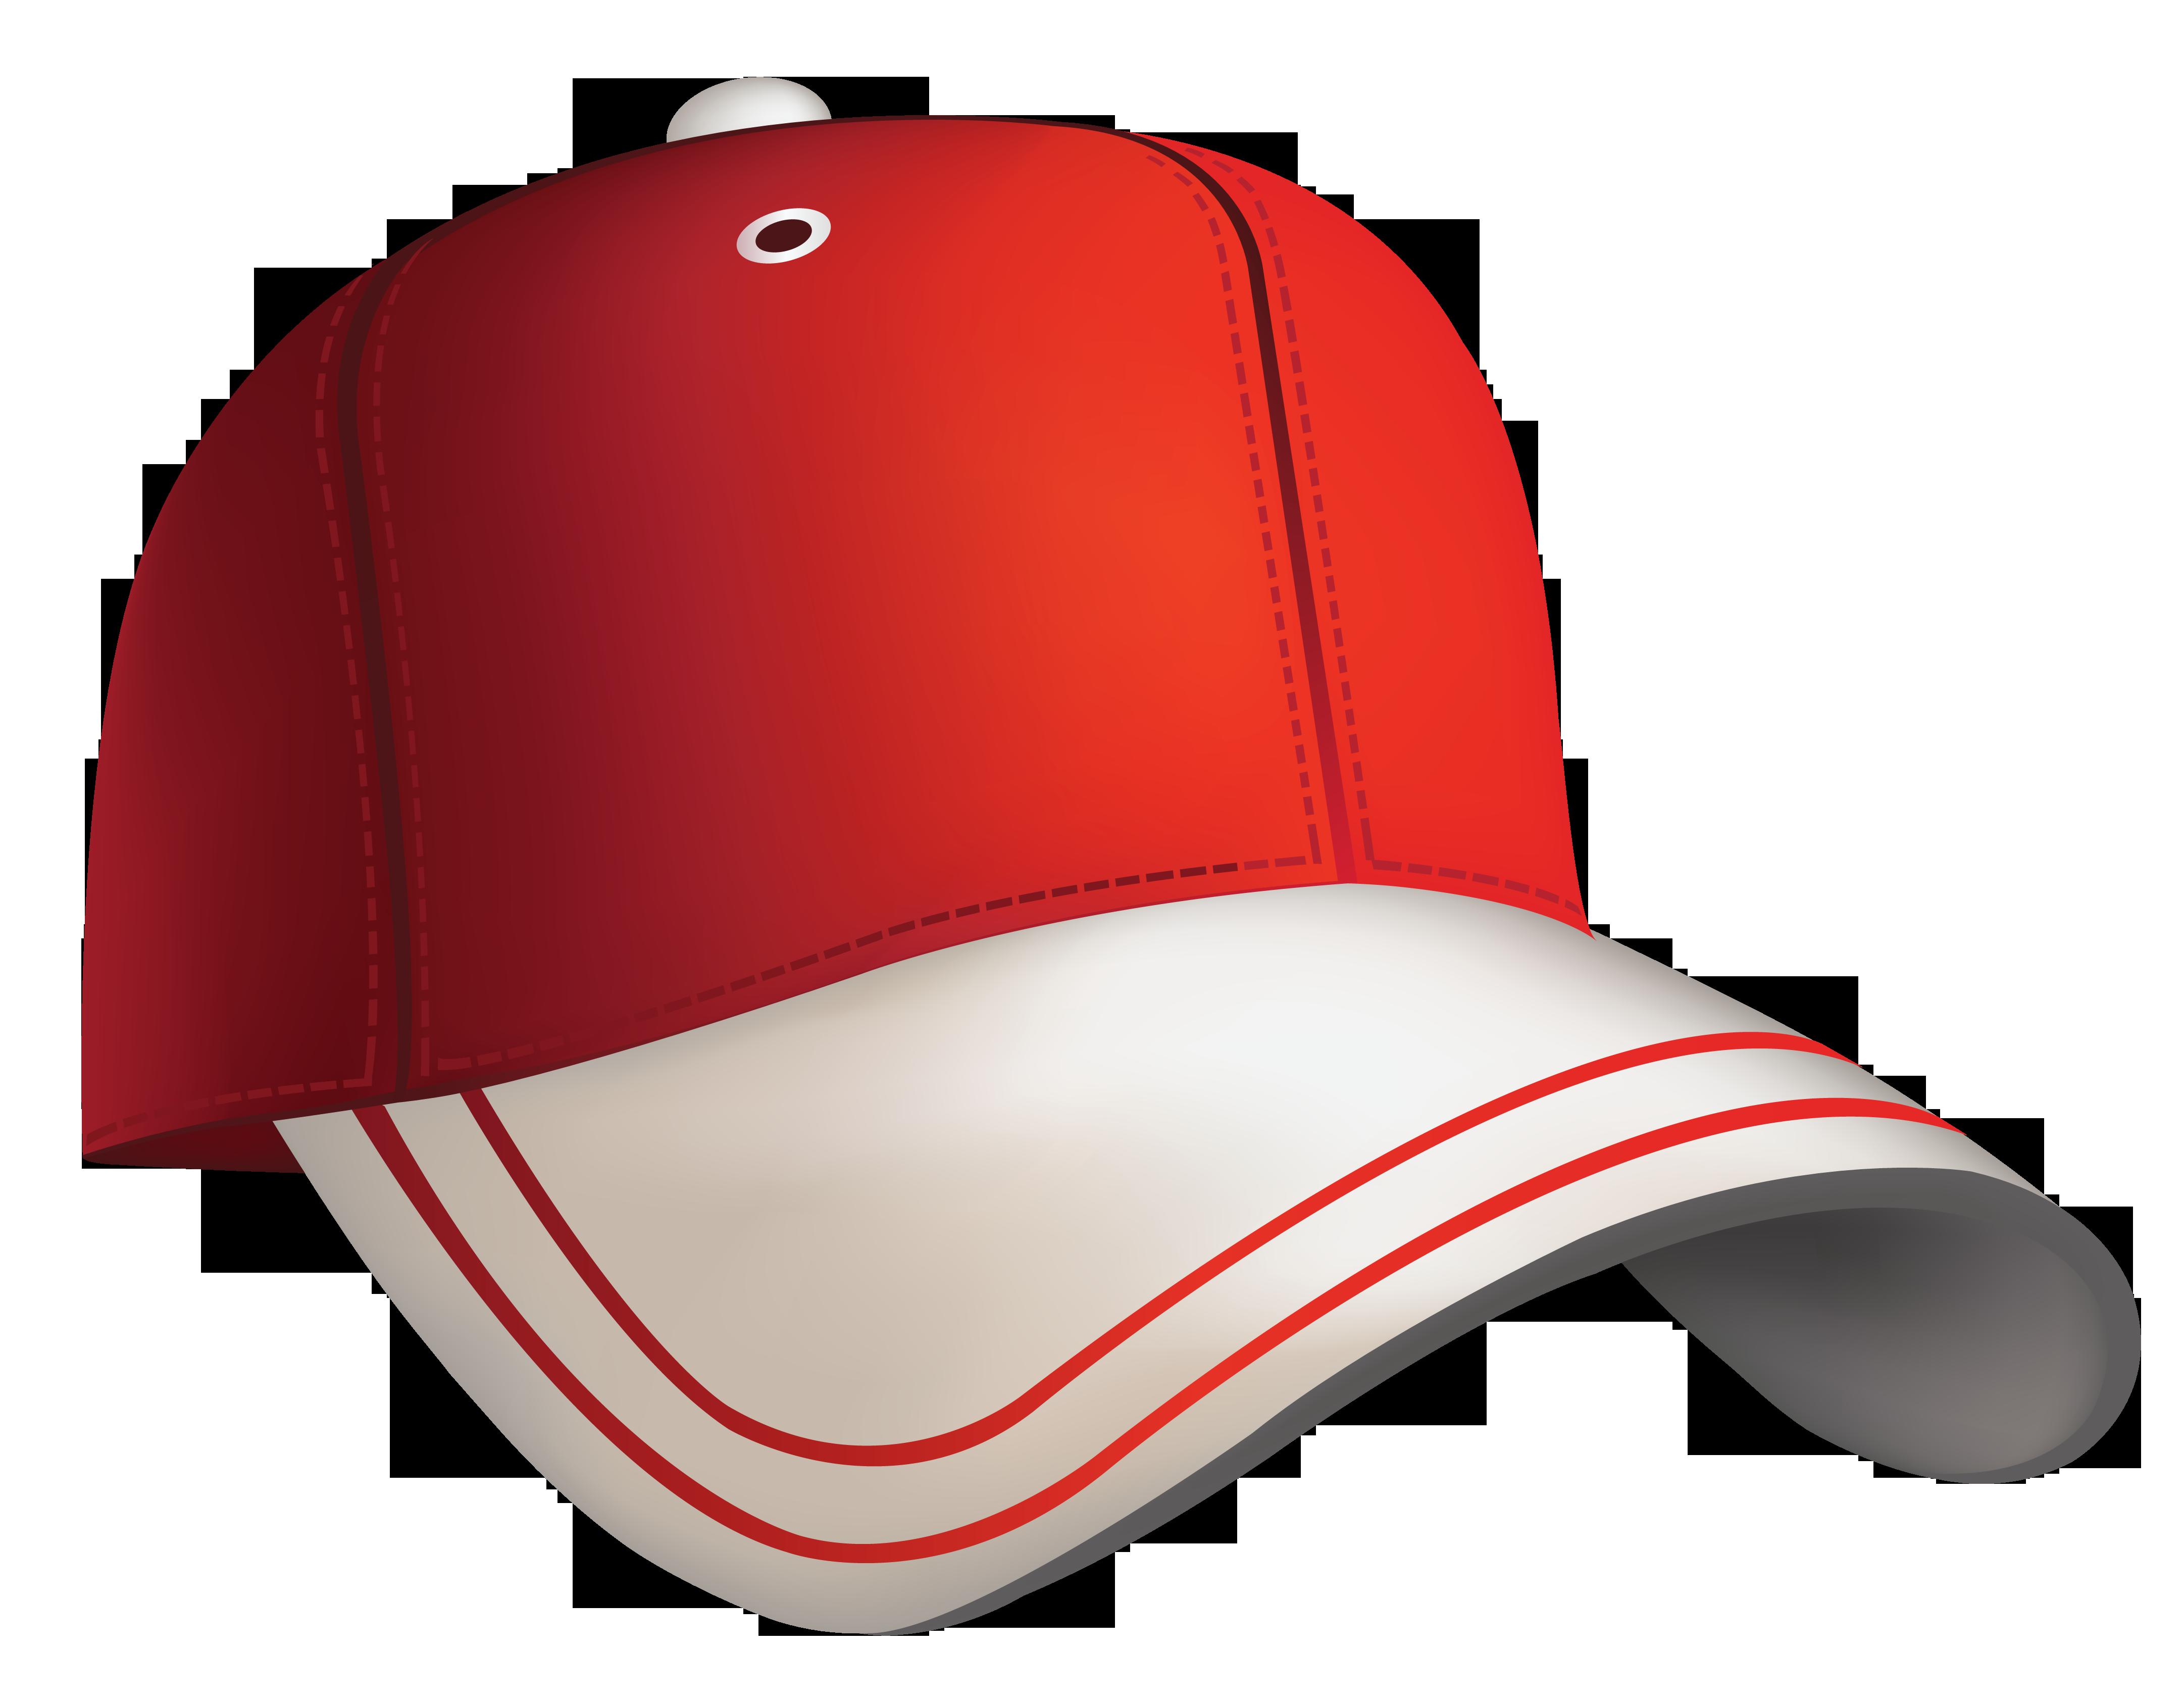 baseball hat clipart. Download Png Image Baseball Cap Png Image